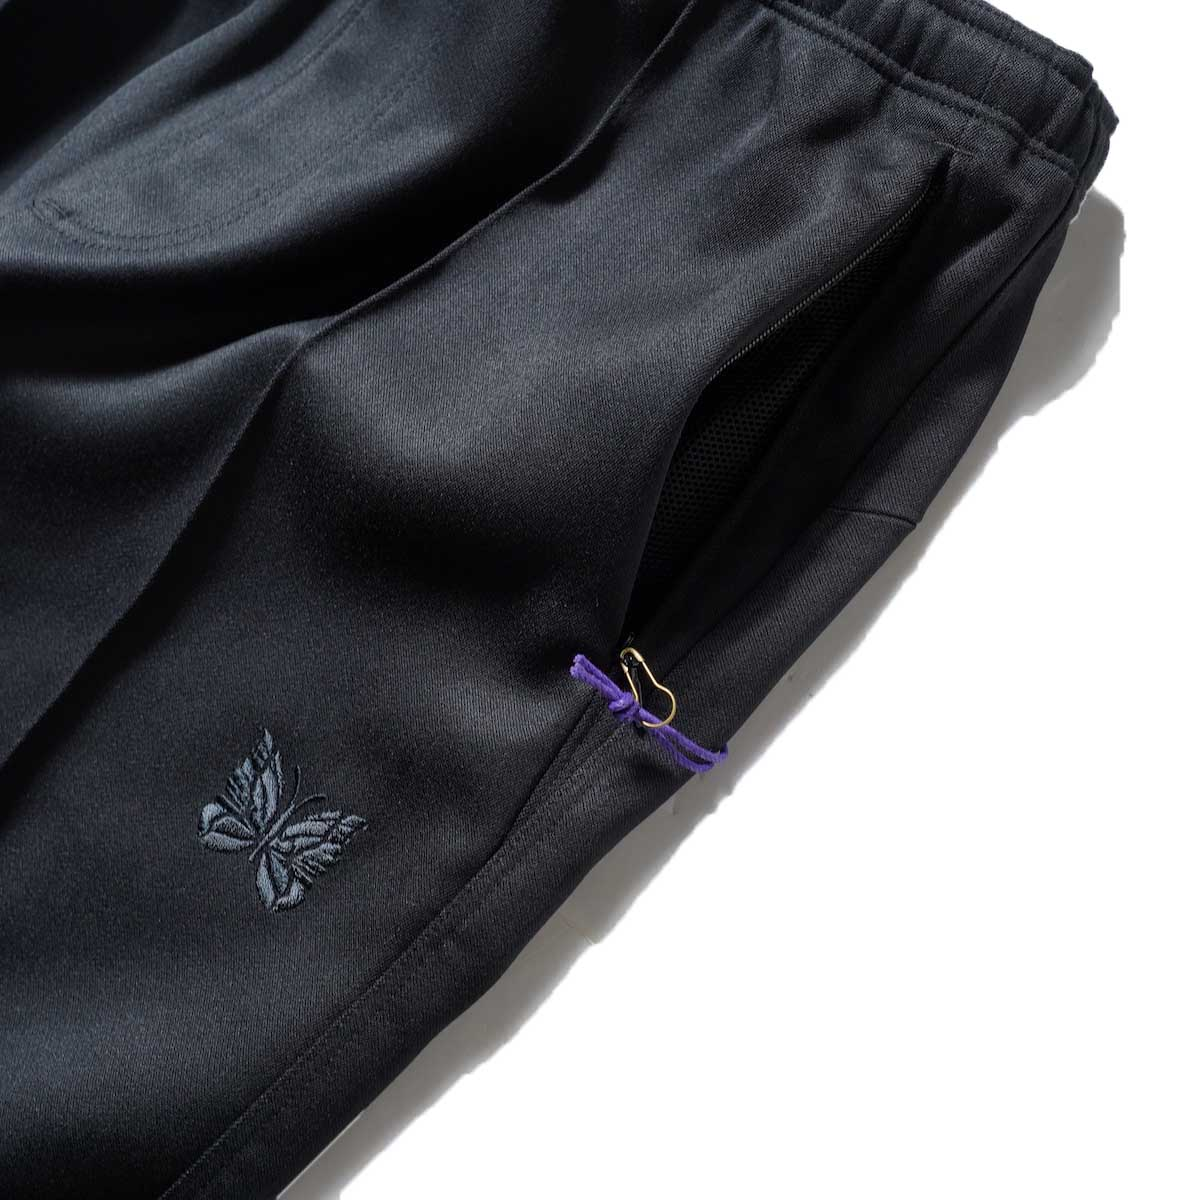 Needles / W.U. BOOT-CUT PANT - PE/R DOESKIN (Black)サイドポケット